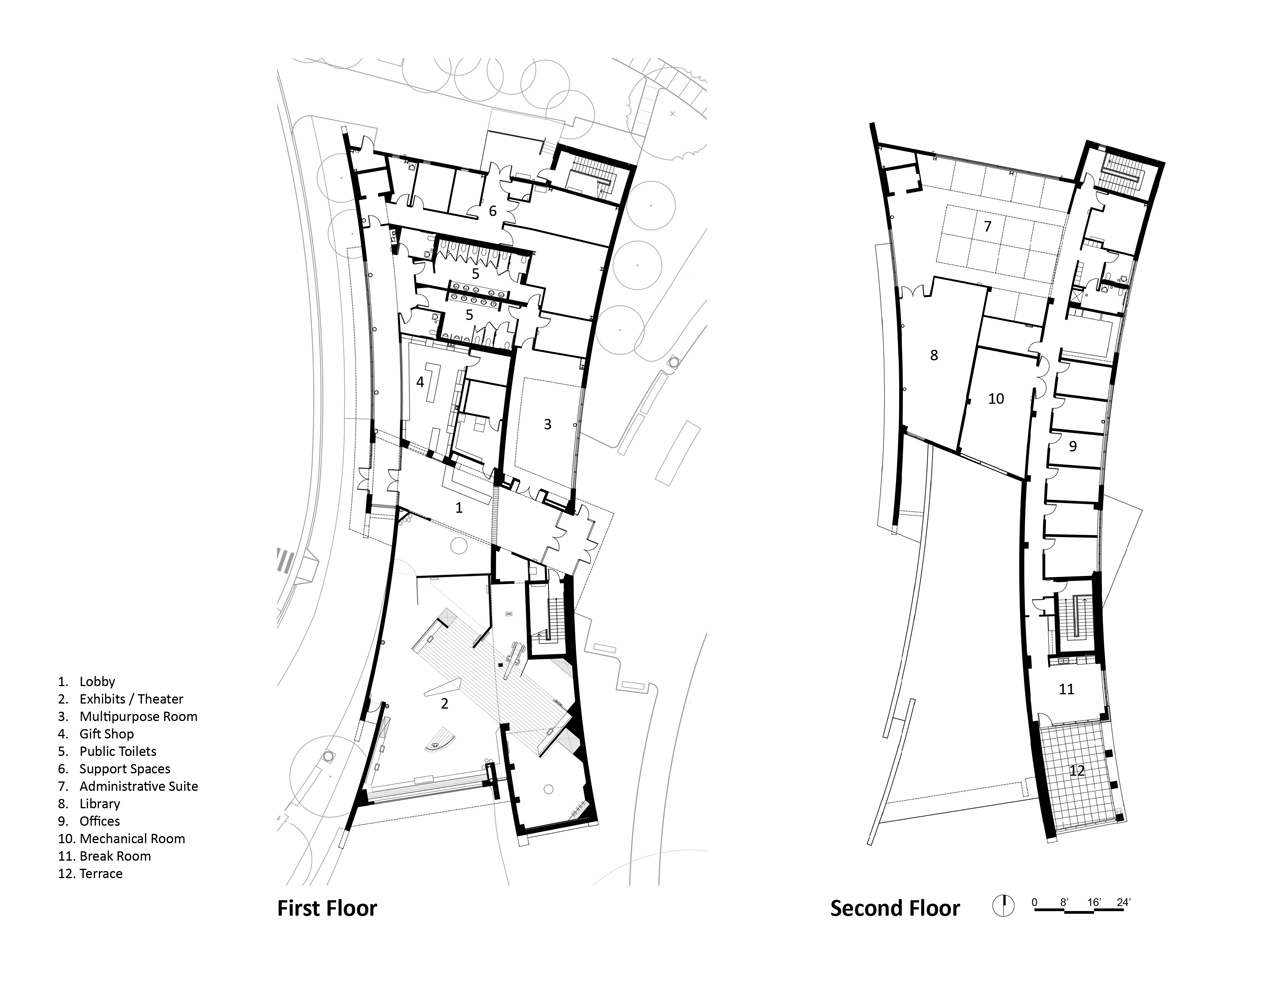 De Plan Choice Floor Plan Furniture Layout App